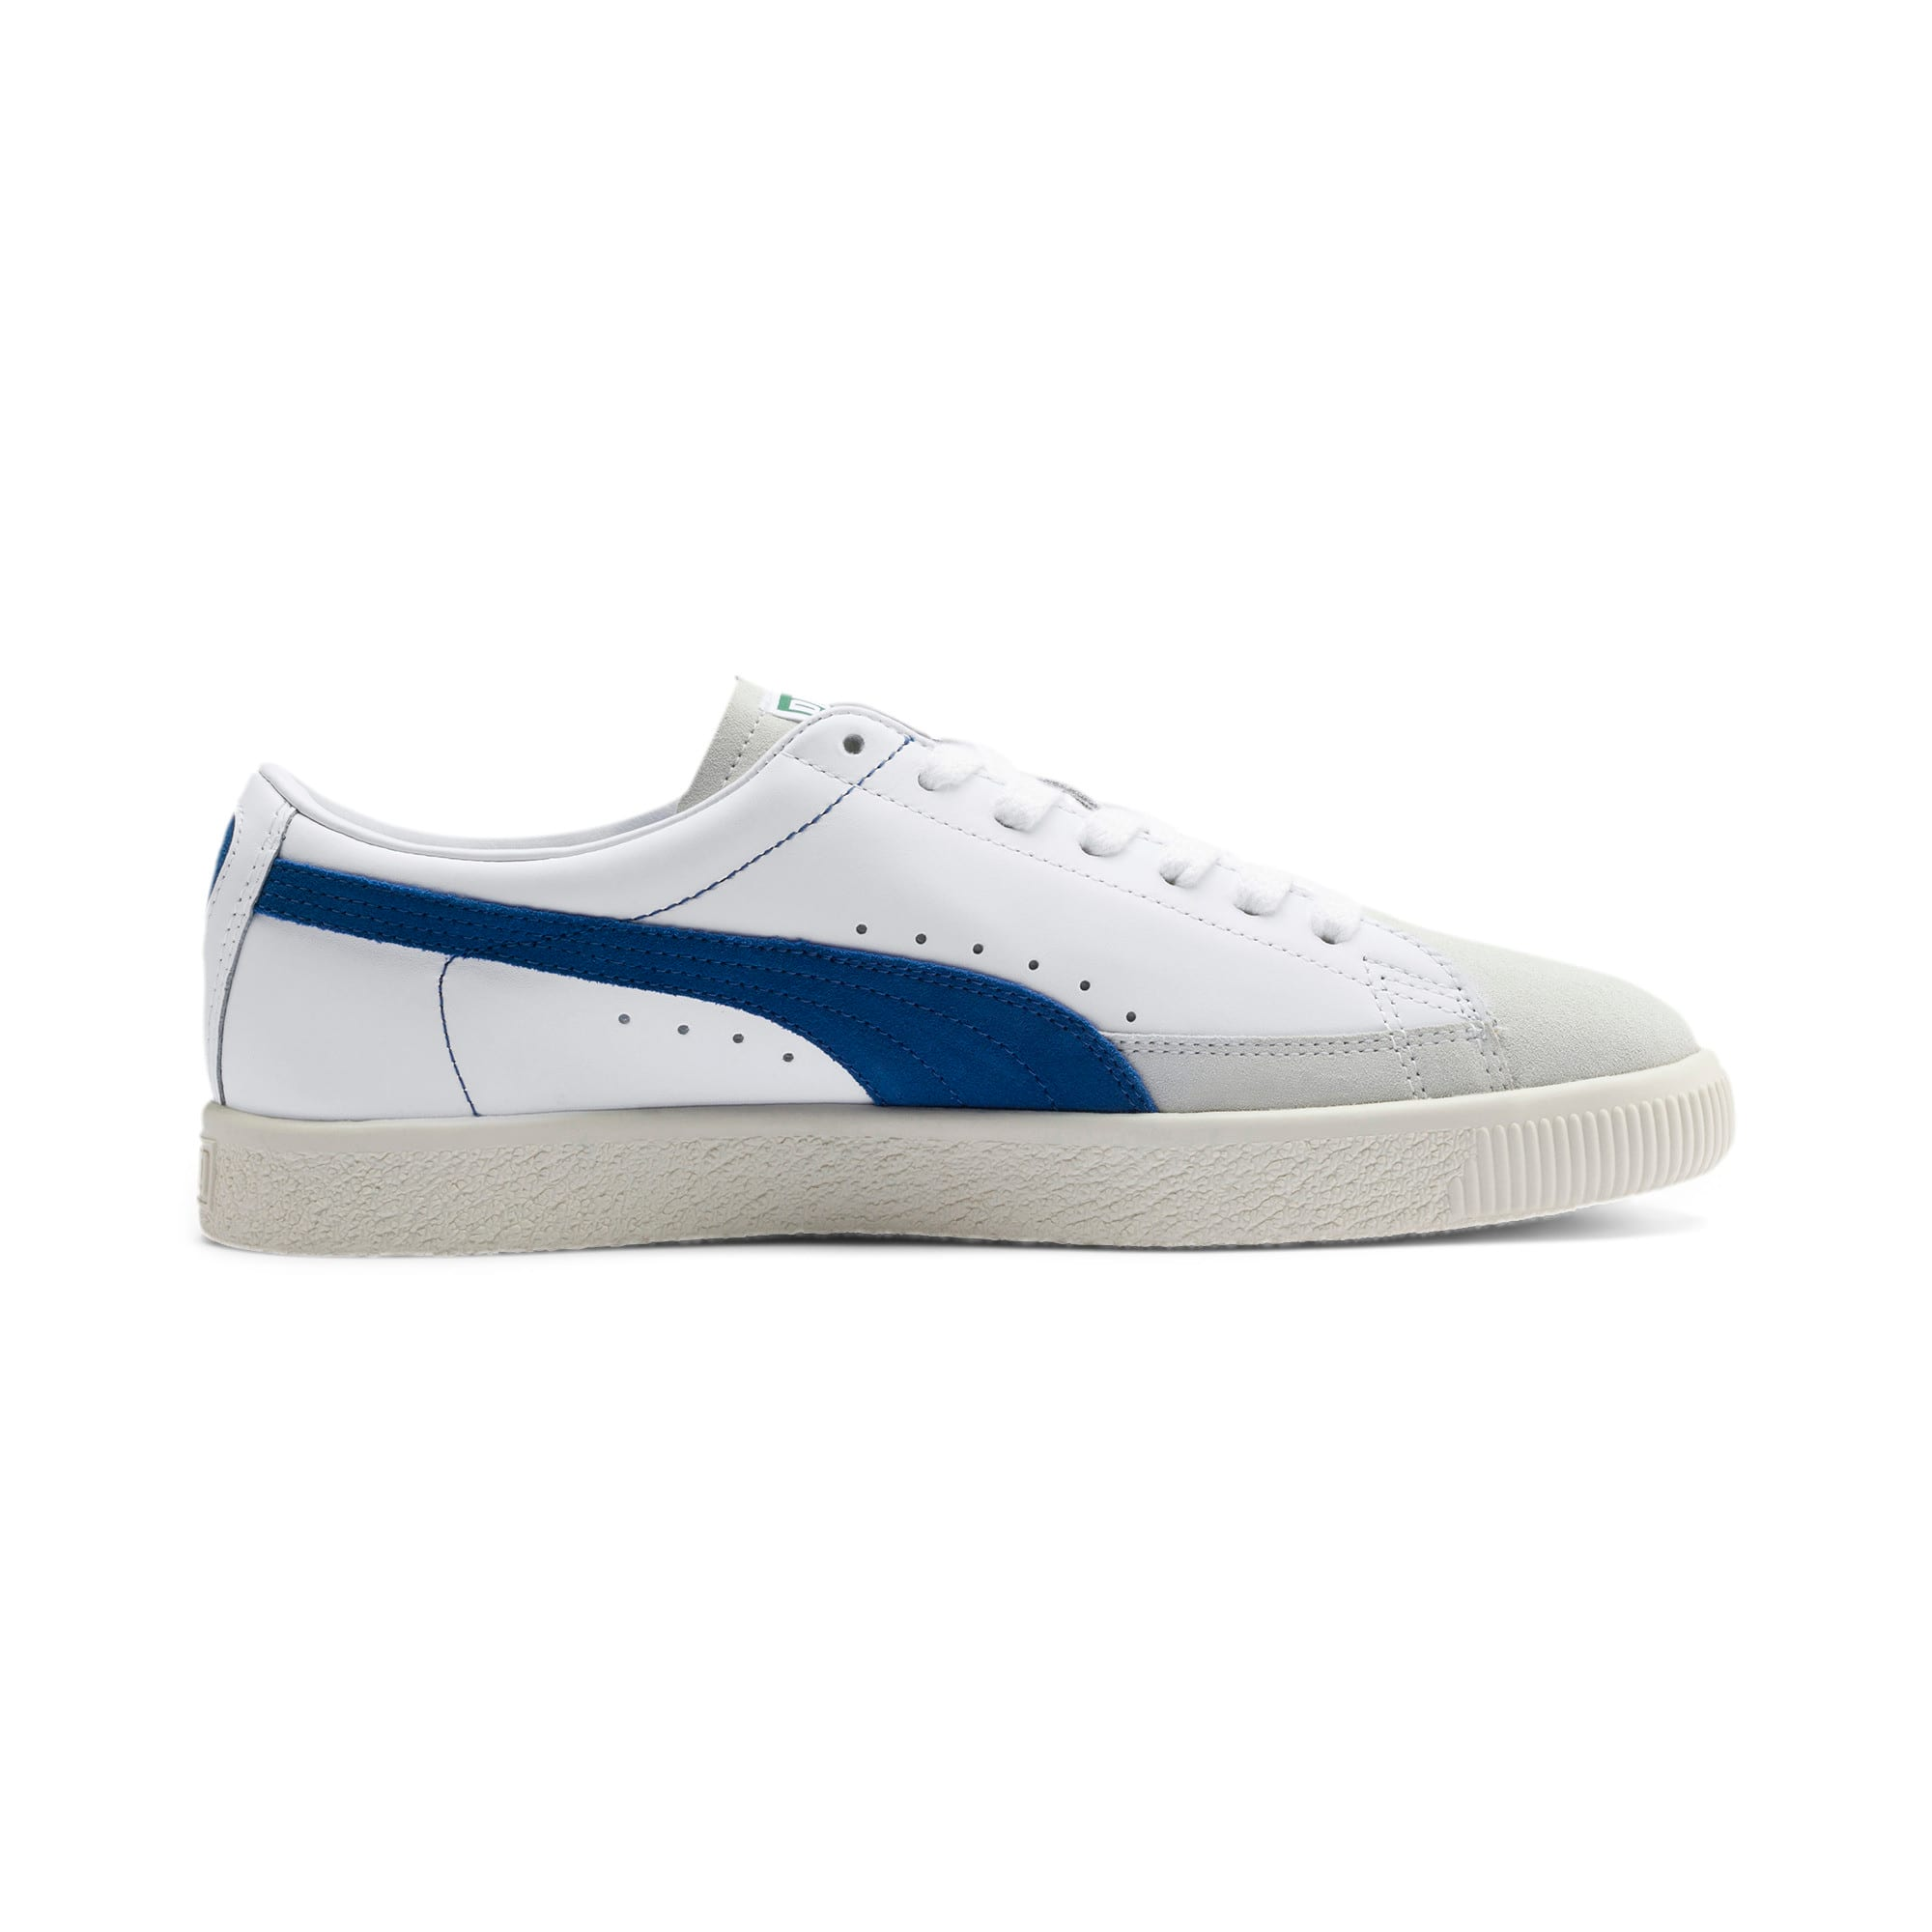 Thumbnail 6 of Basket 90680 Sneakers, Puma White-Galaxy Blue-Whisp, medium